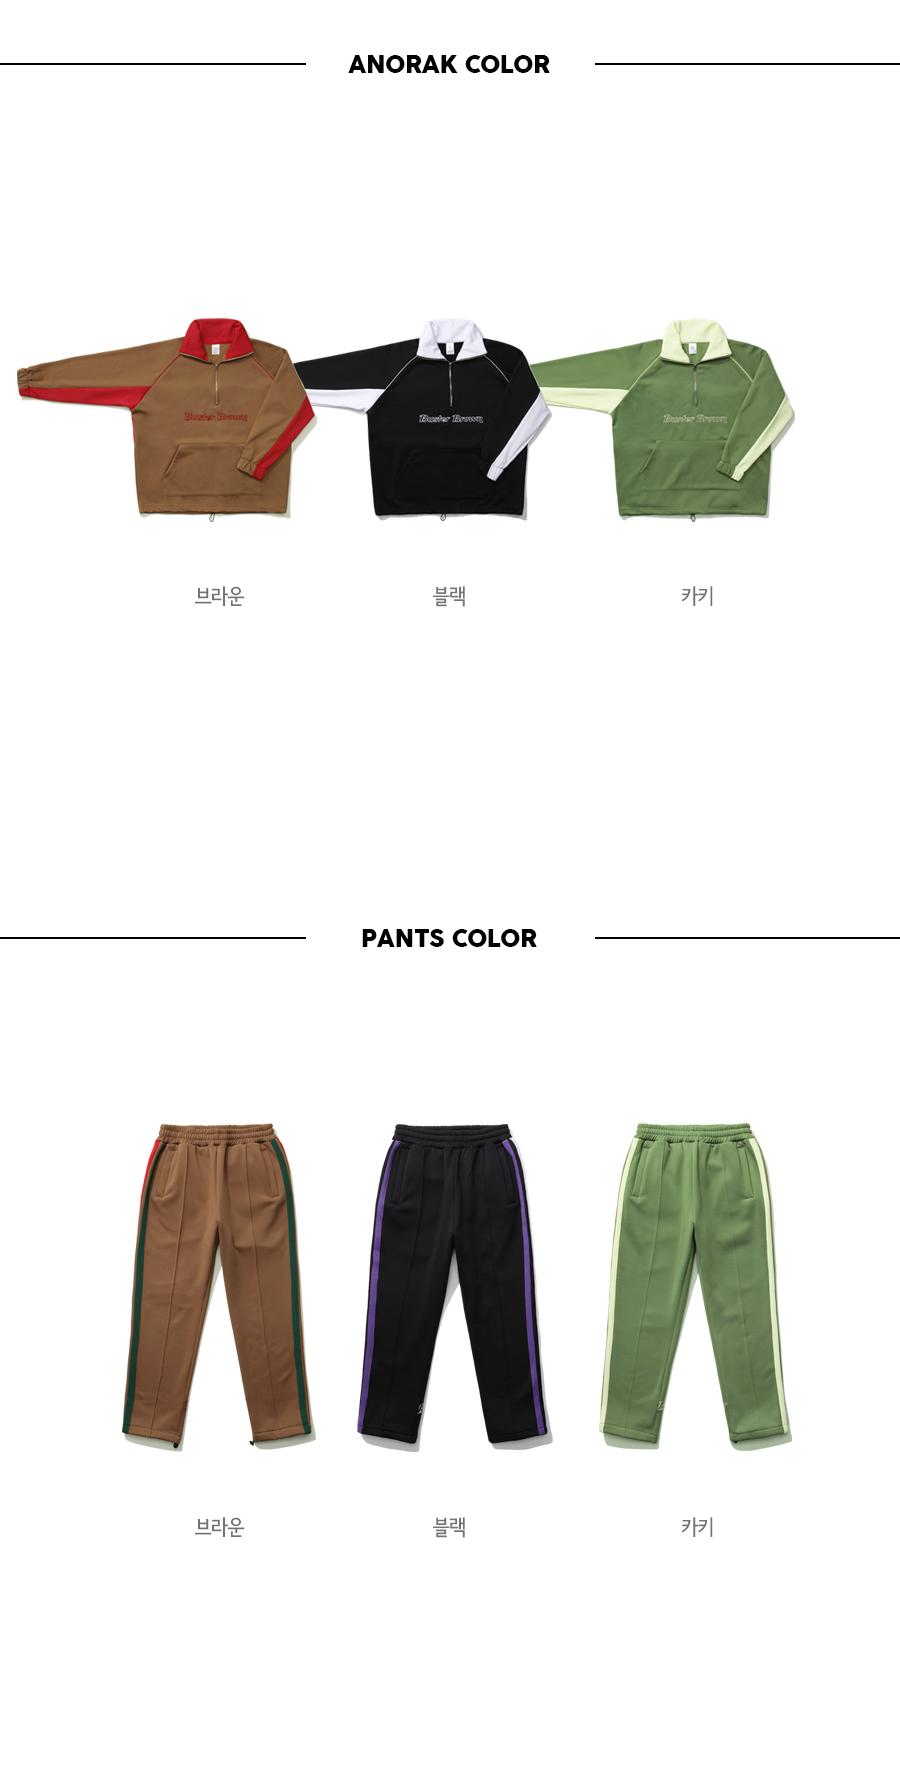 20181011_coloration_training_set_color_kj.jpg